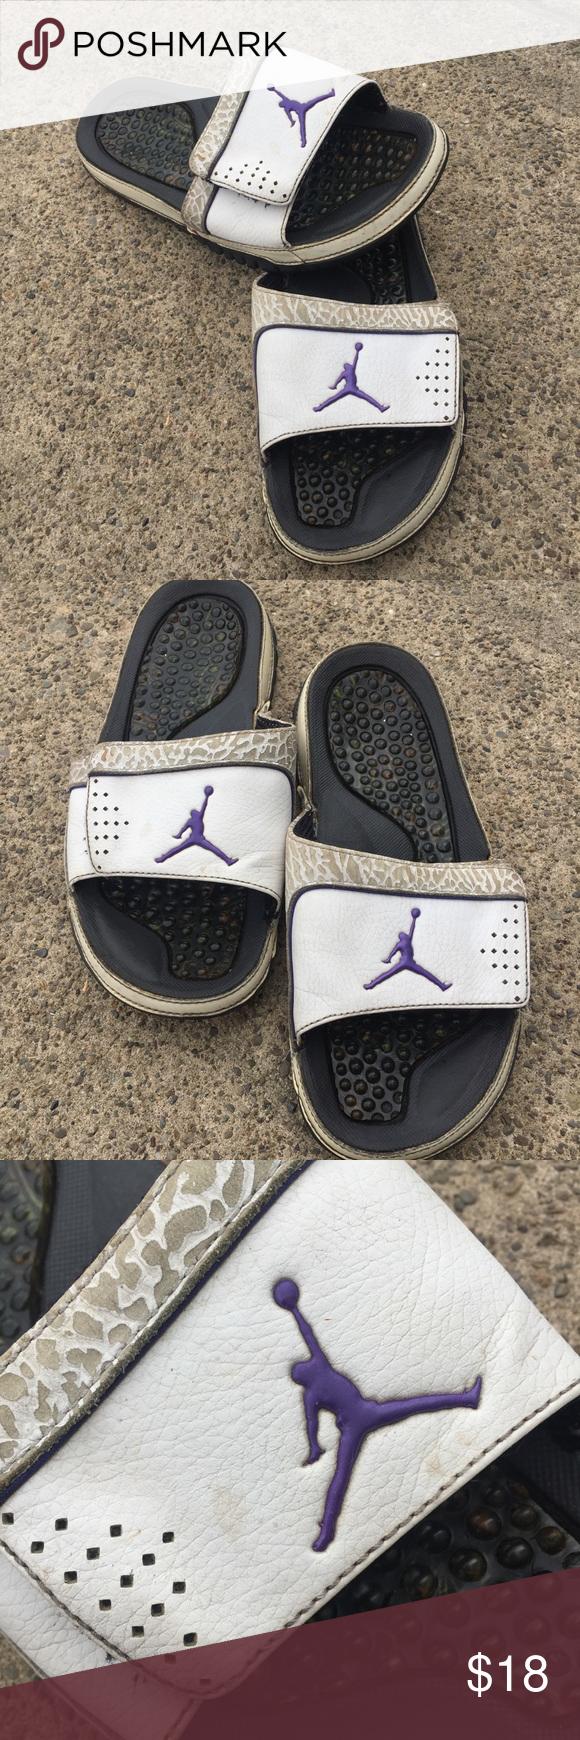 feed288d008f White and Purple Jordan Slides Mens size 7 White and purple Jordan slides. Men s  size 7